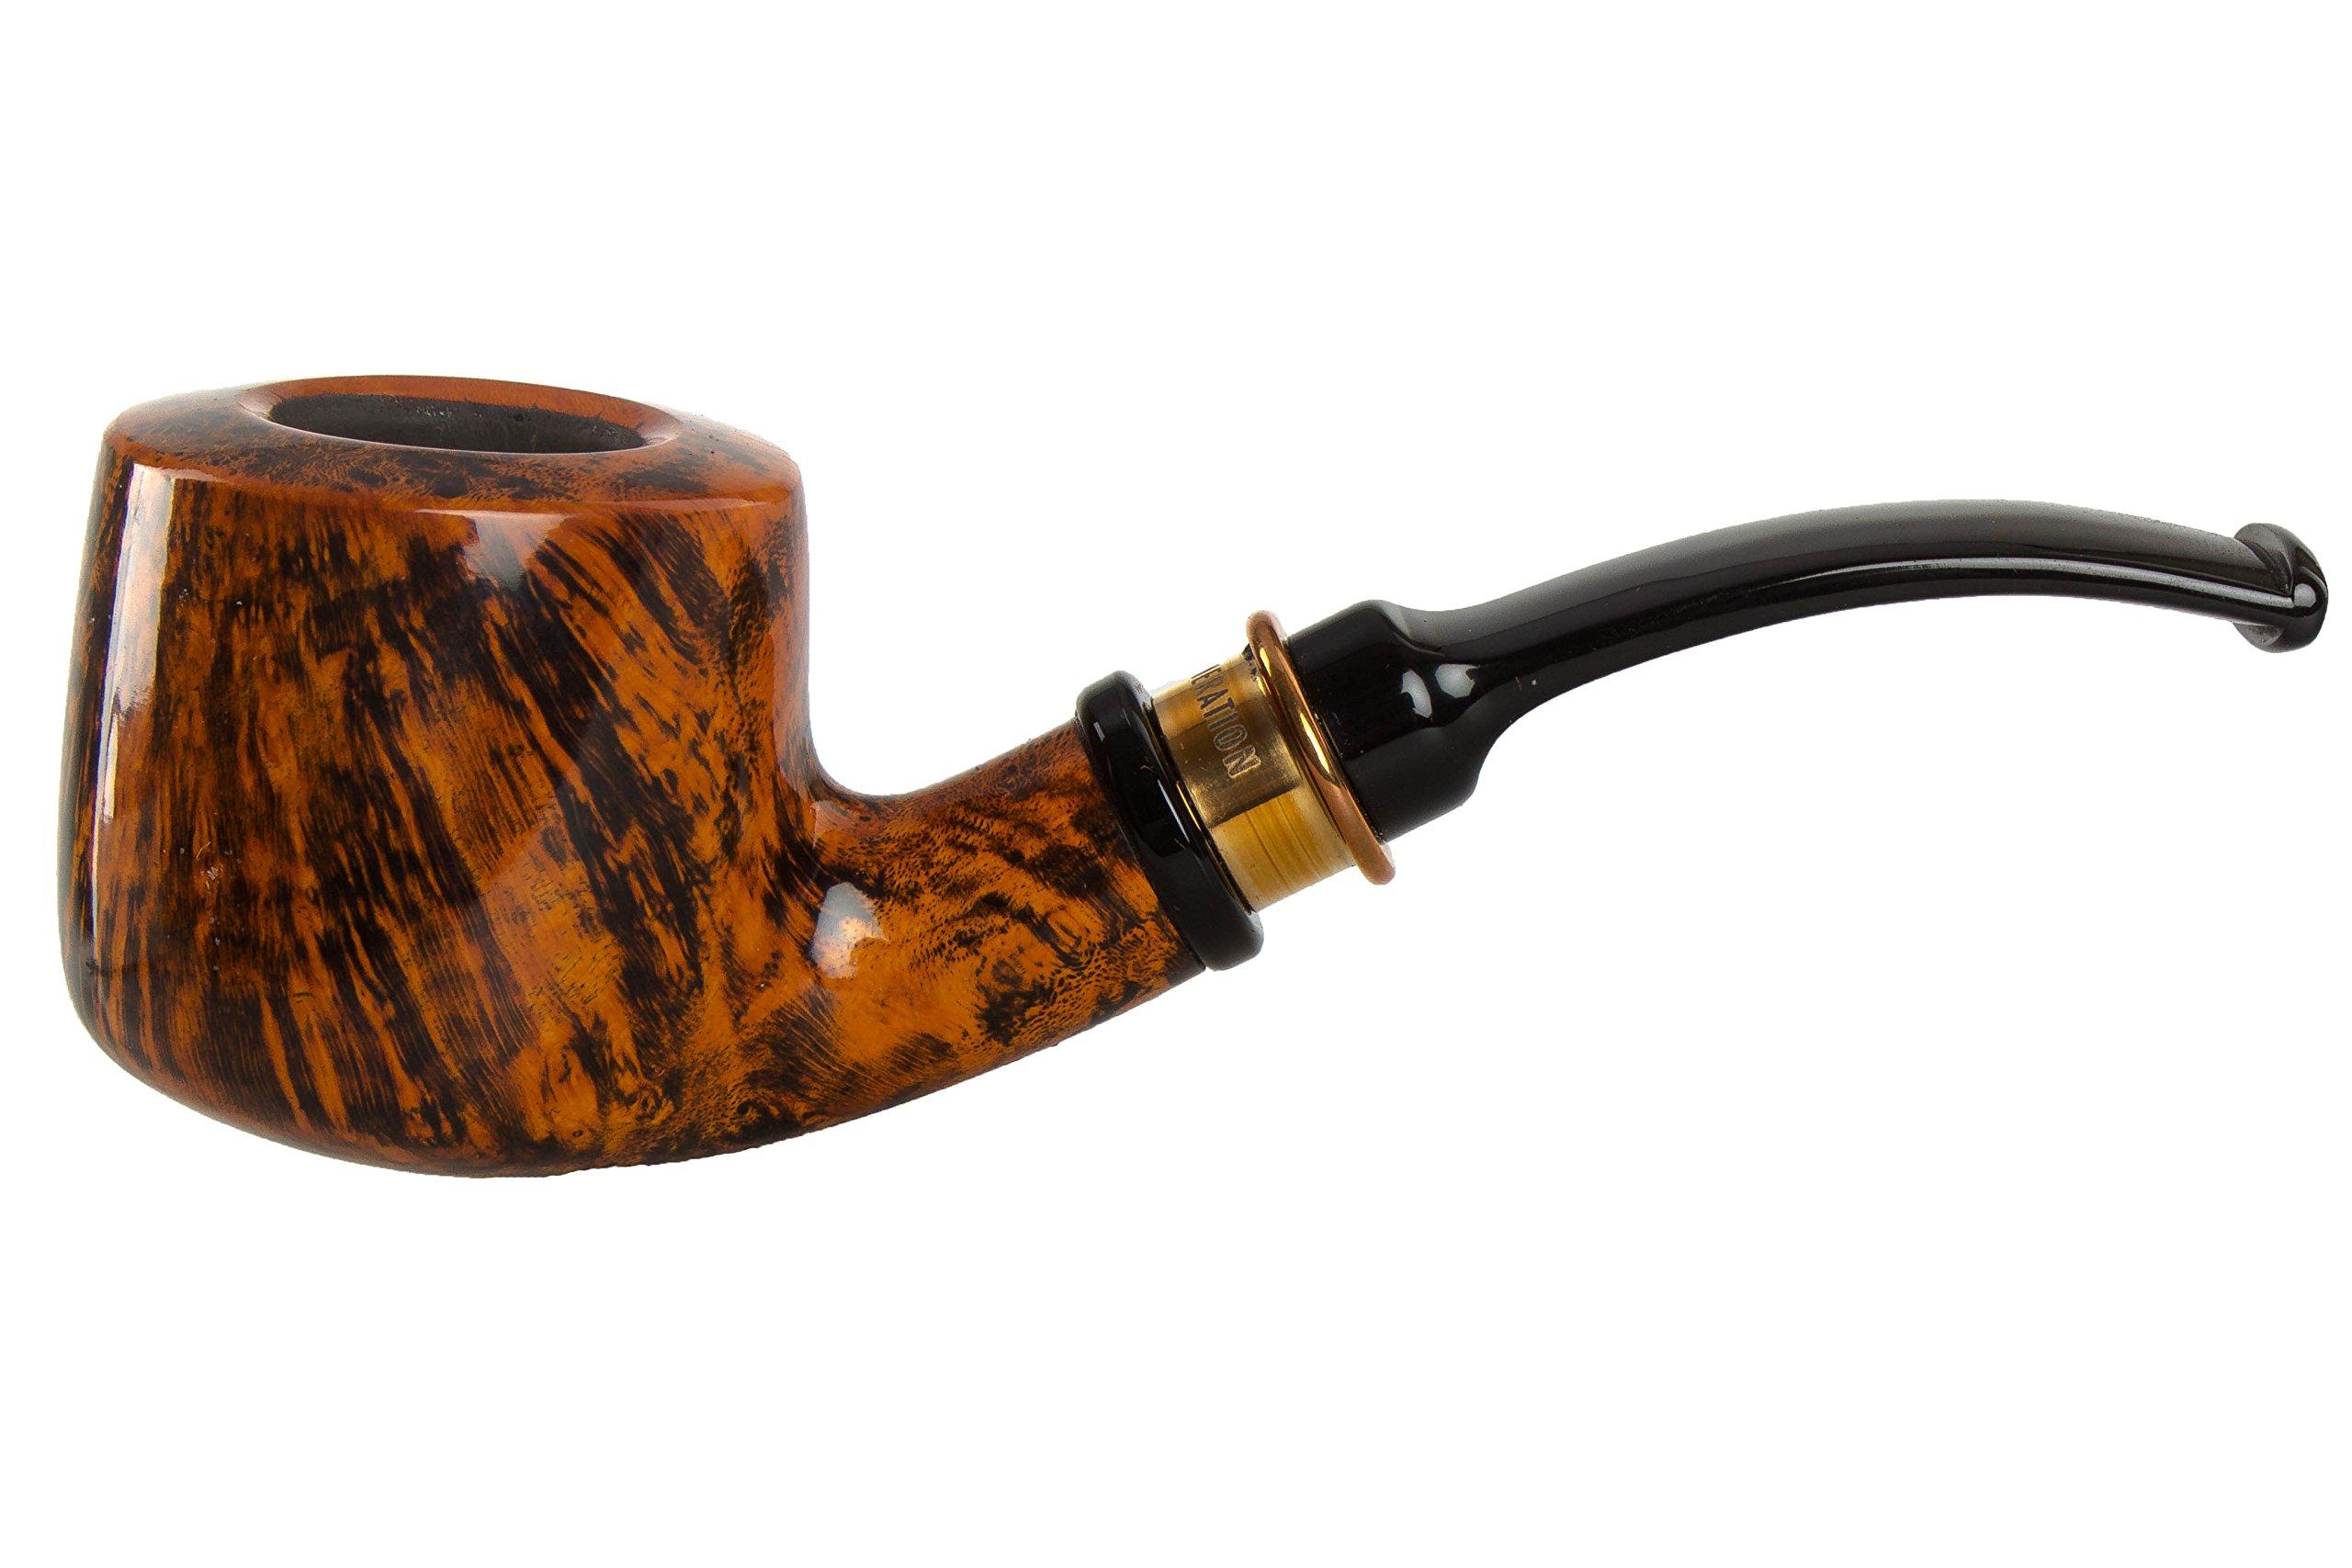 4th Generation 1897 Tobacco Pipe - Burnt Sienna